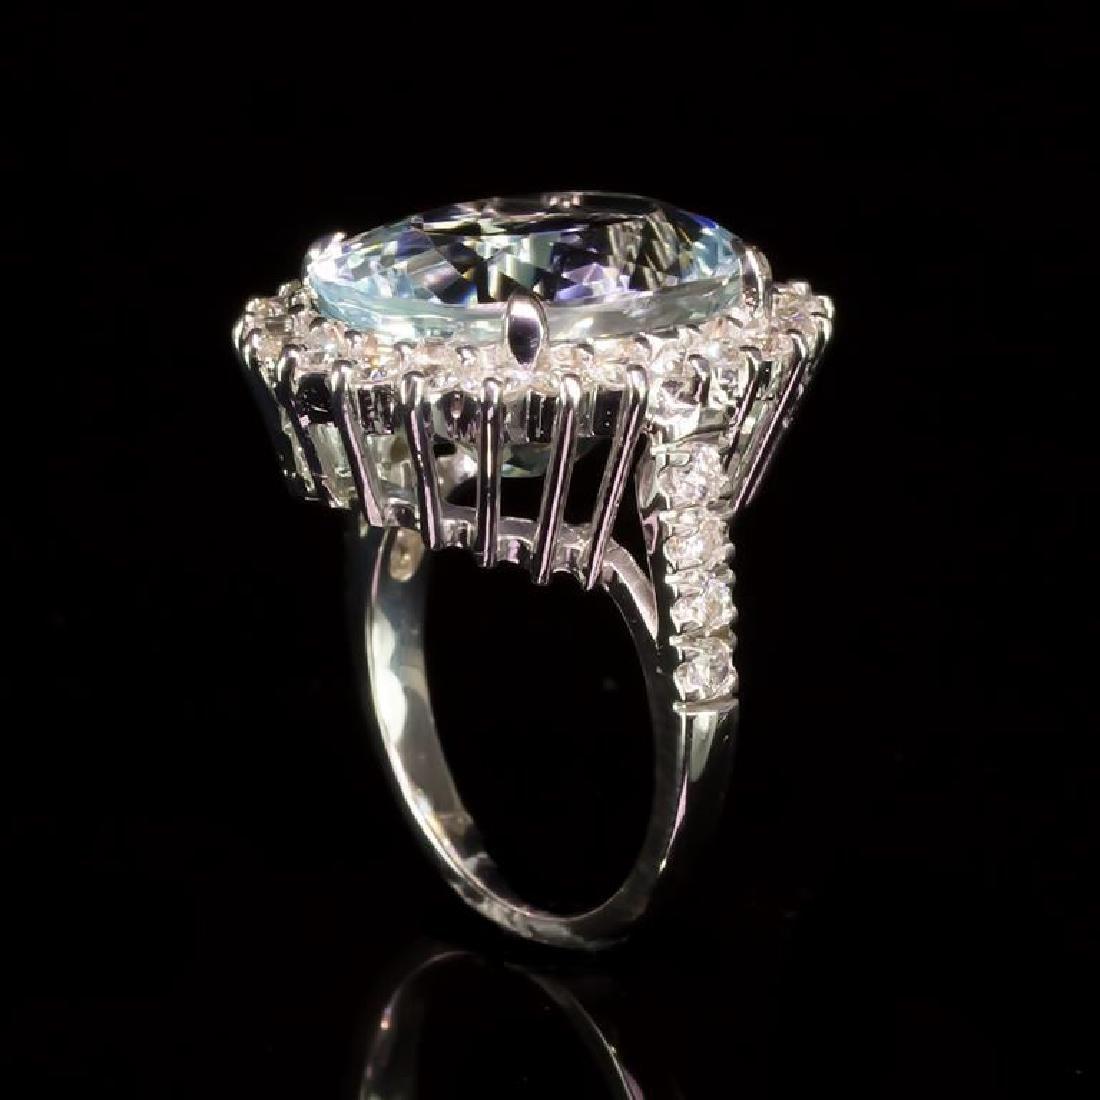 14K Gold 12.26ct Aquamarine 1.71ct Diamond Ring - 3